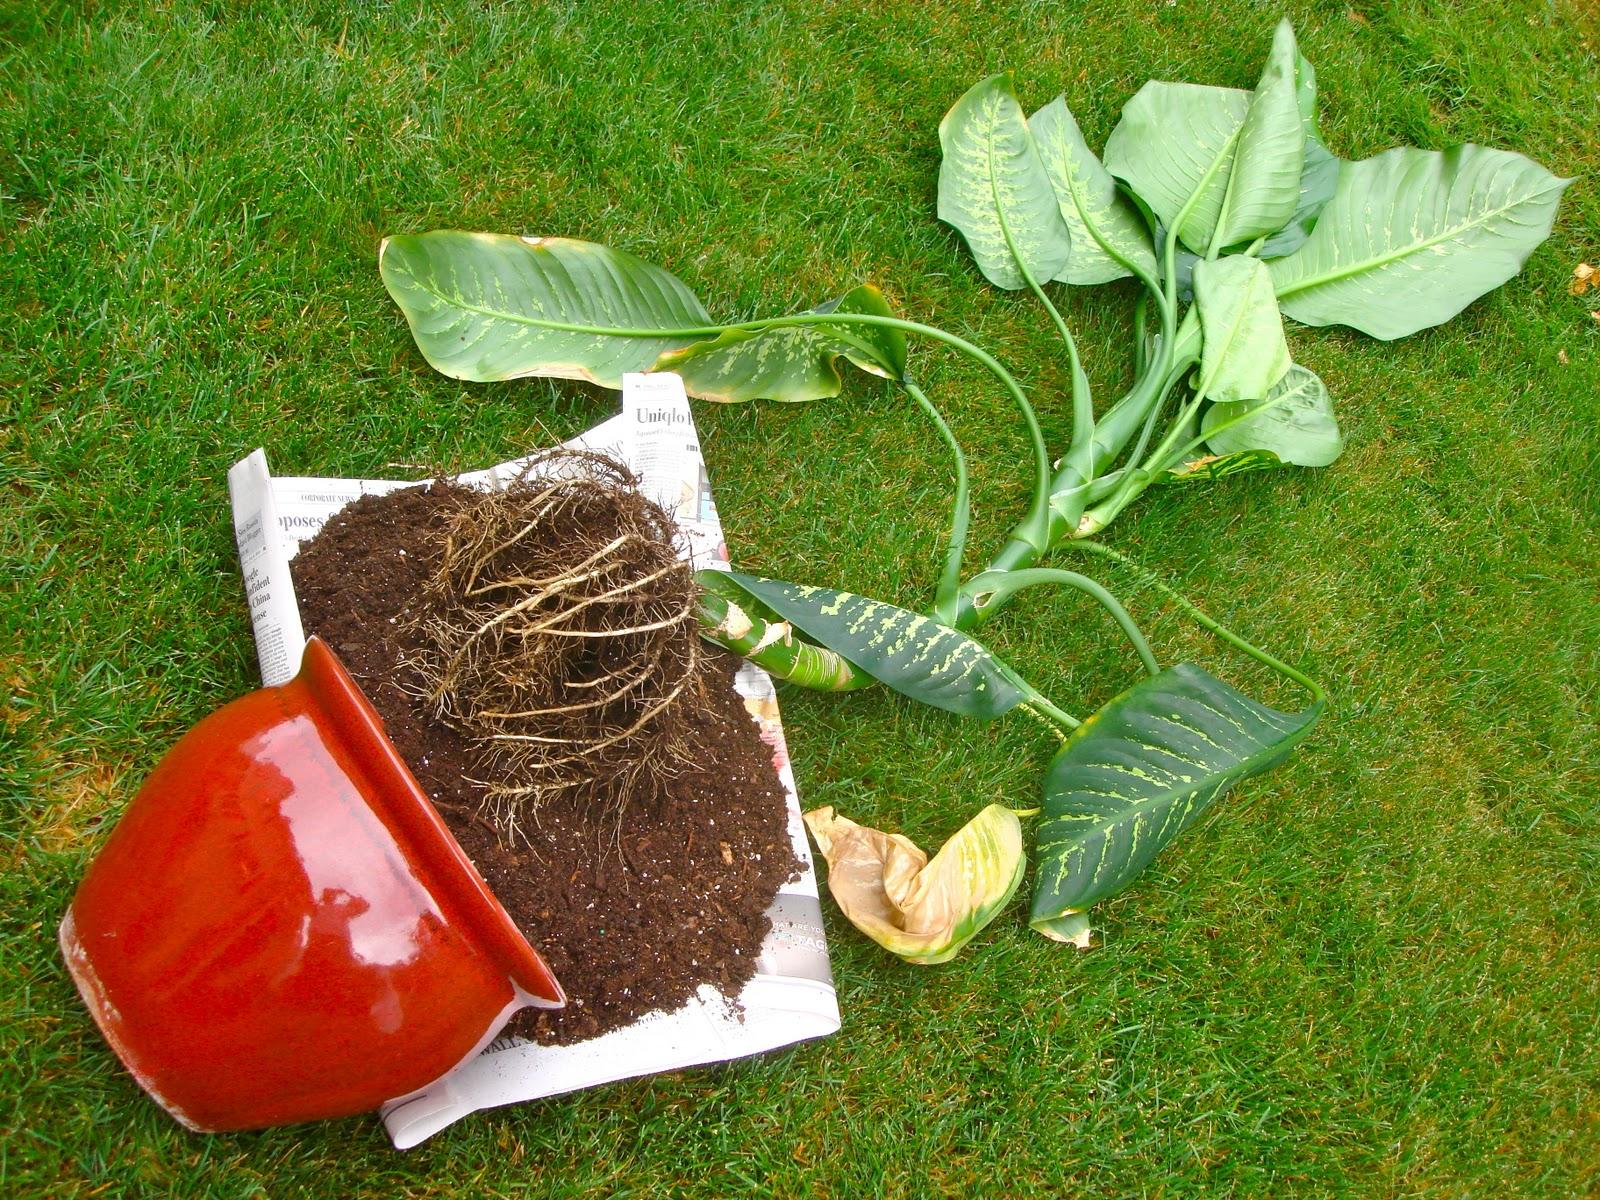 Dieffenbachia ground for transplanting